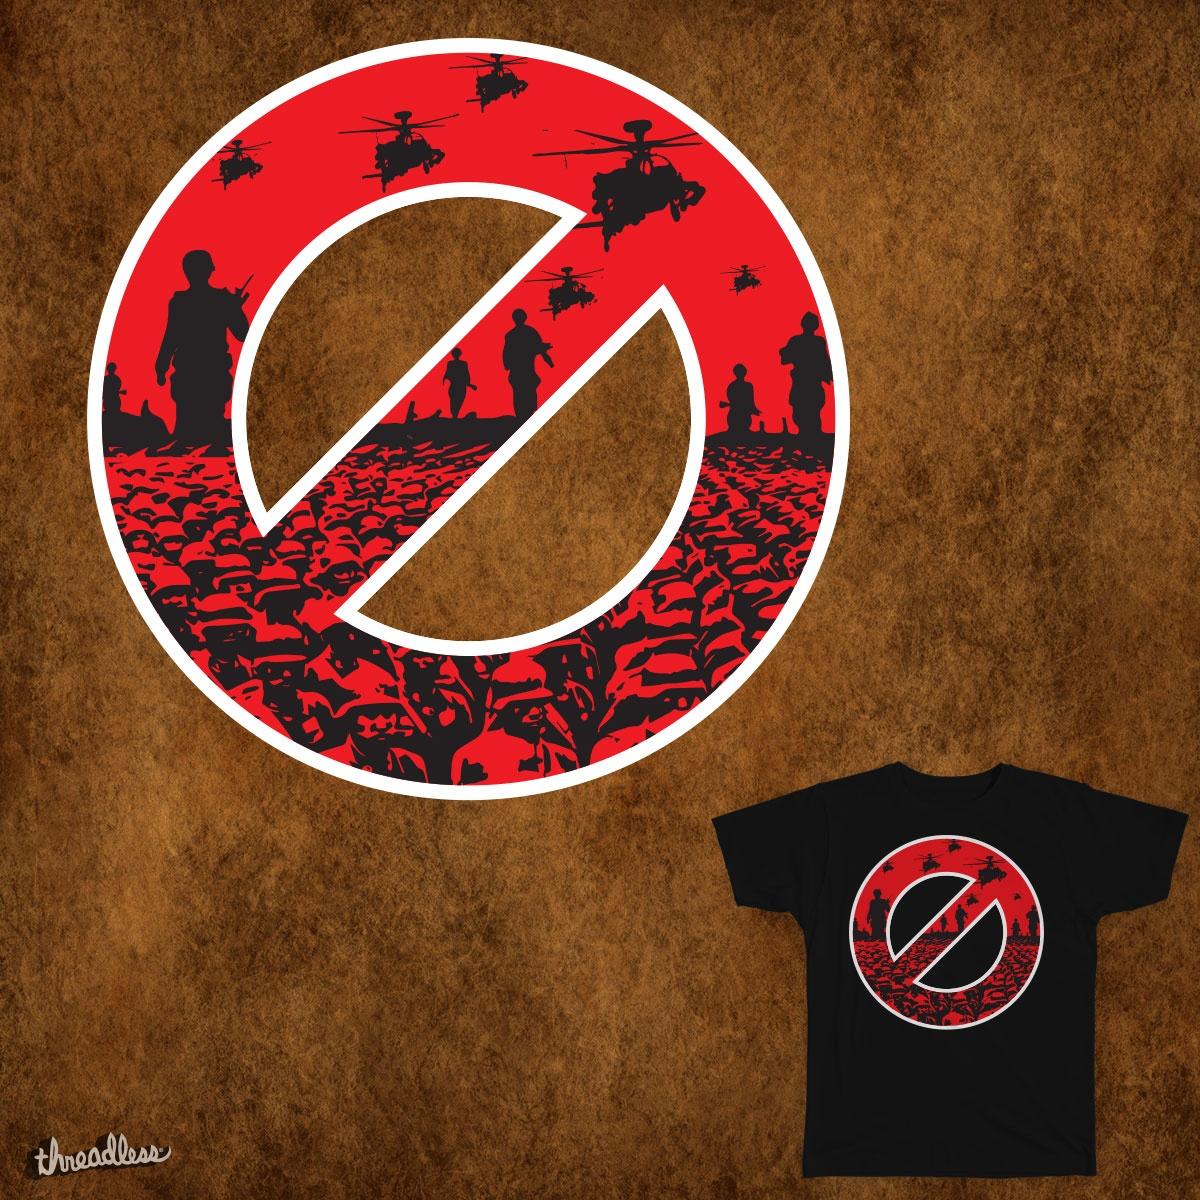 No Wars allowed by rroknom on Threadless